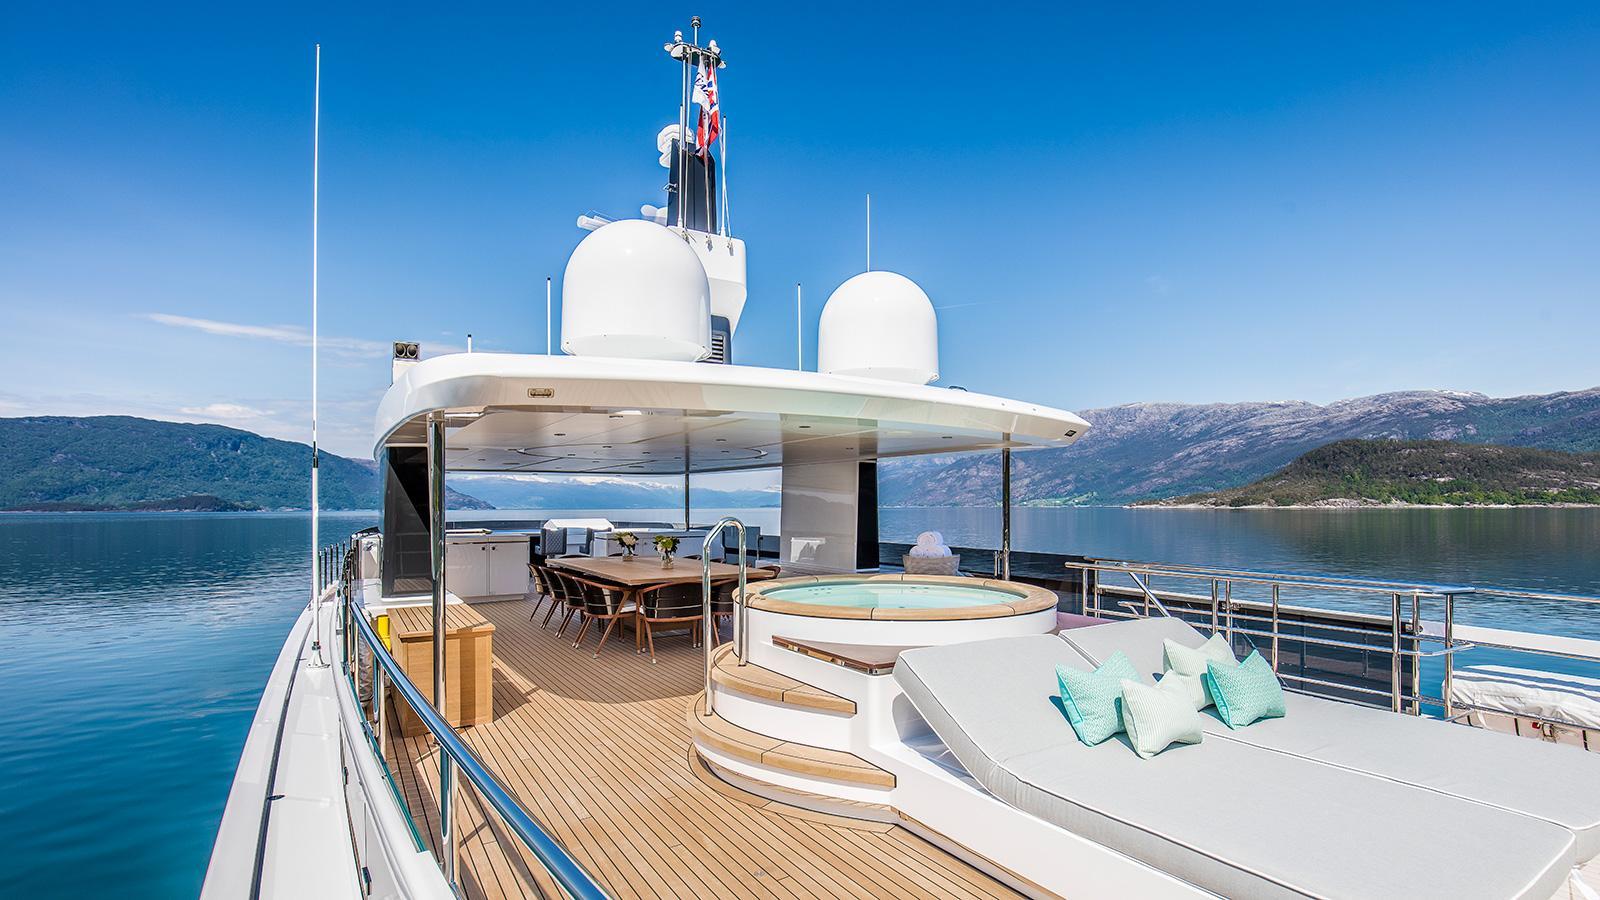 Kamino-super-yacht-feadship-2016-34-metres-upper-deck